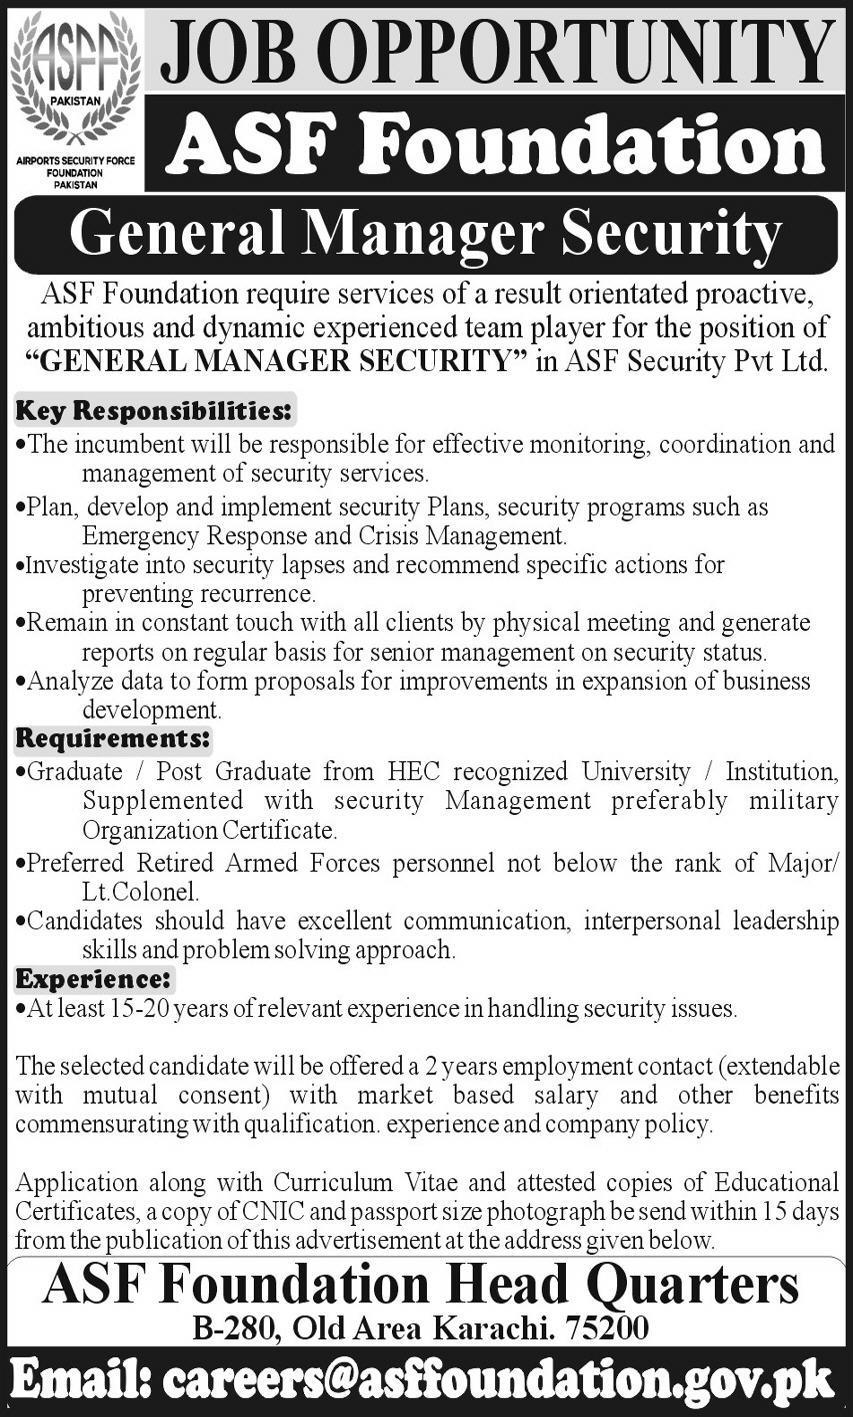 ASF Foundation Jobs 2020 in Karachi